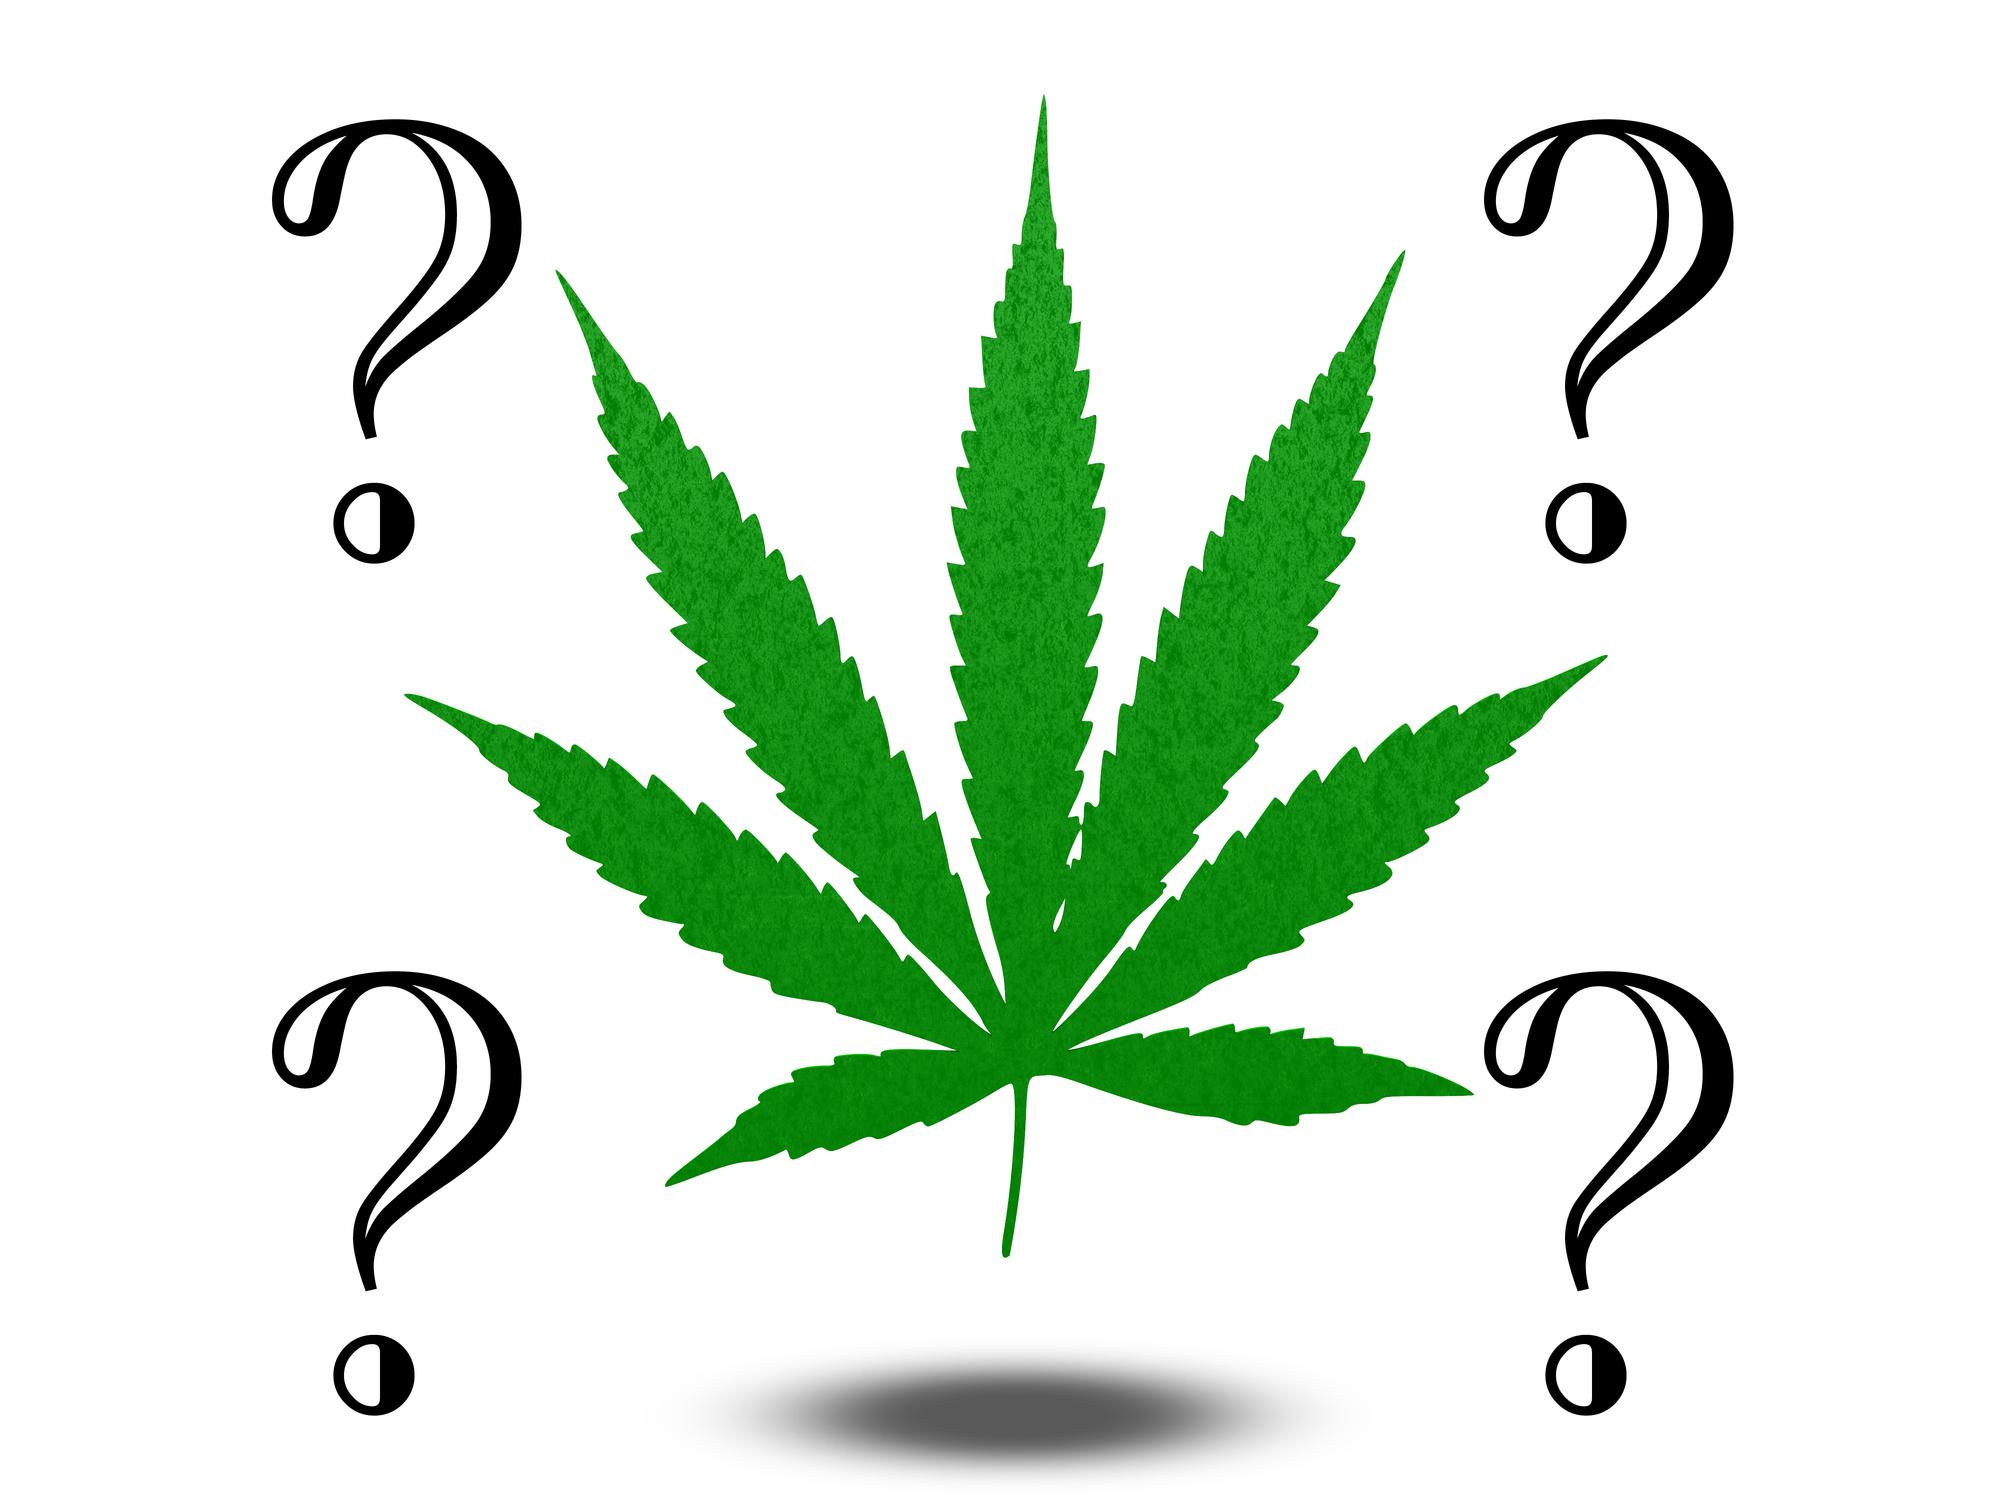 Marijuana leaf with question marks